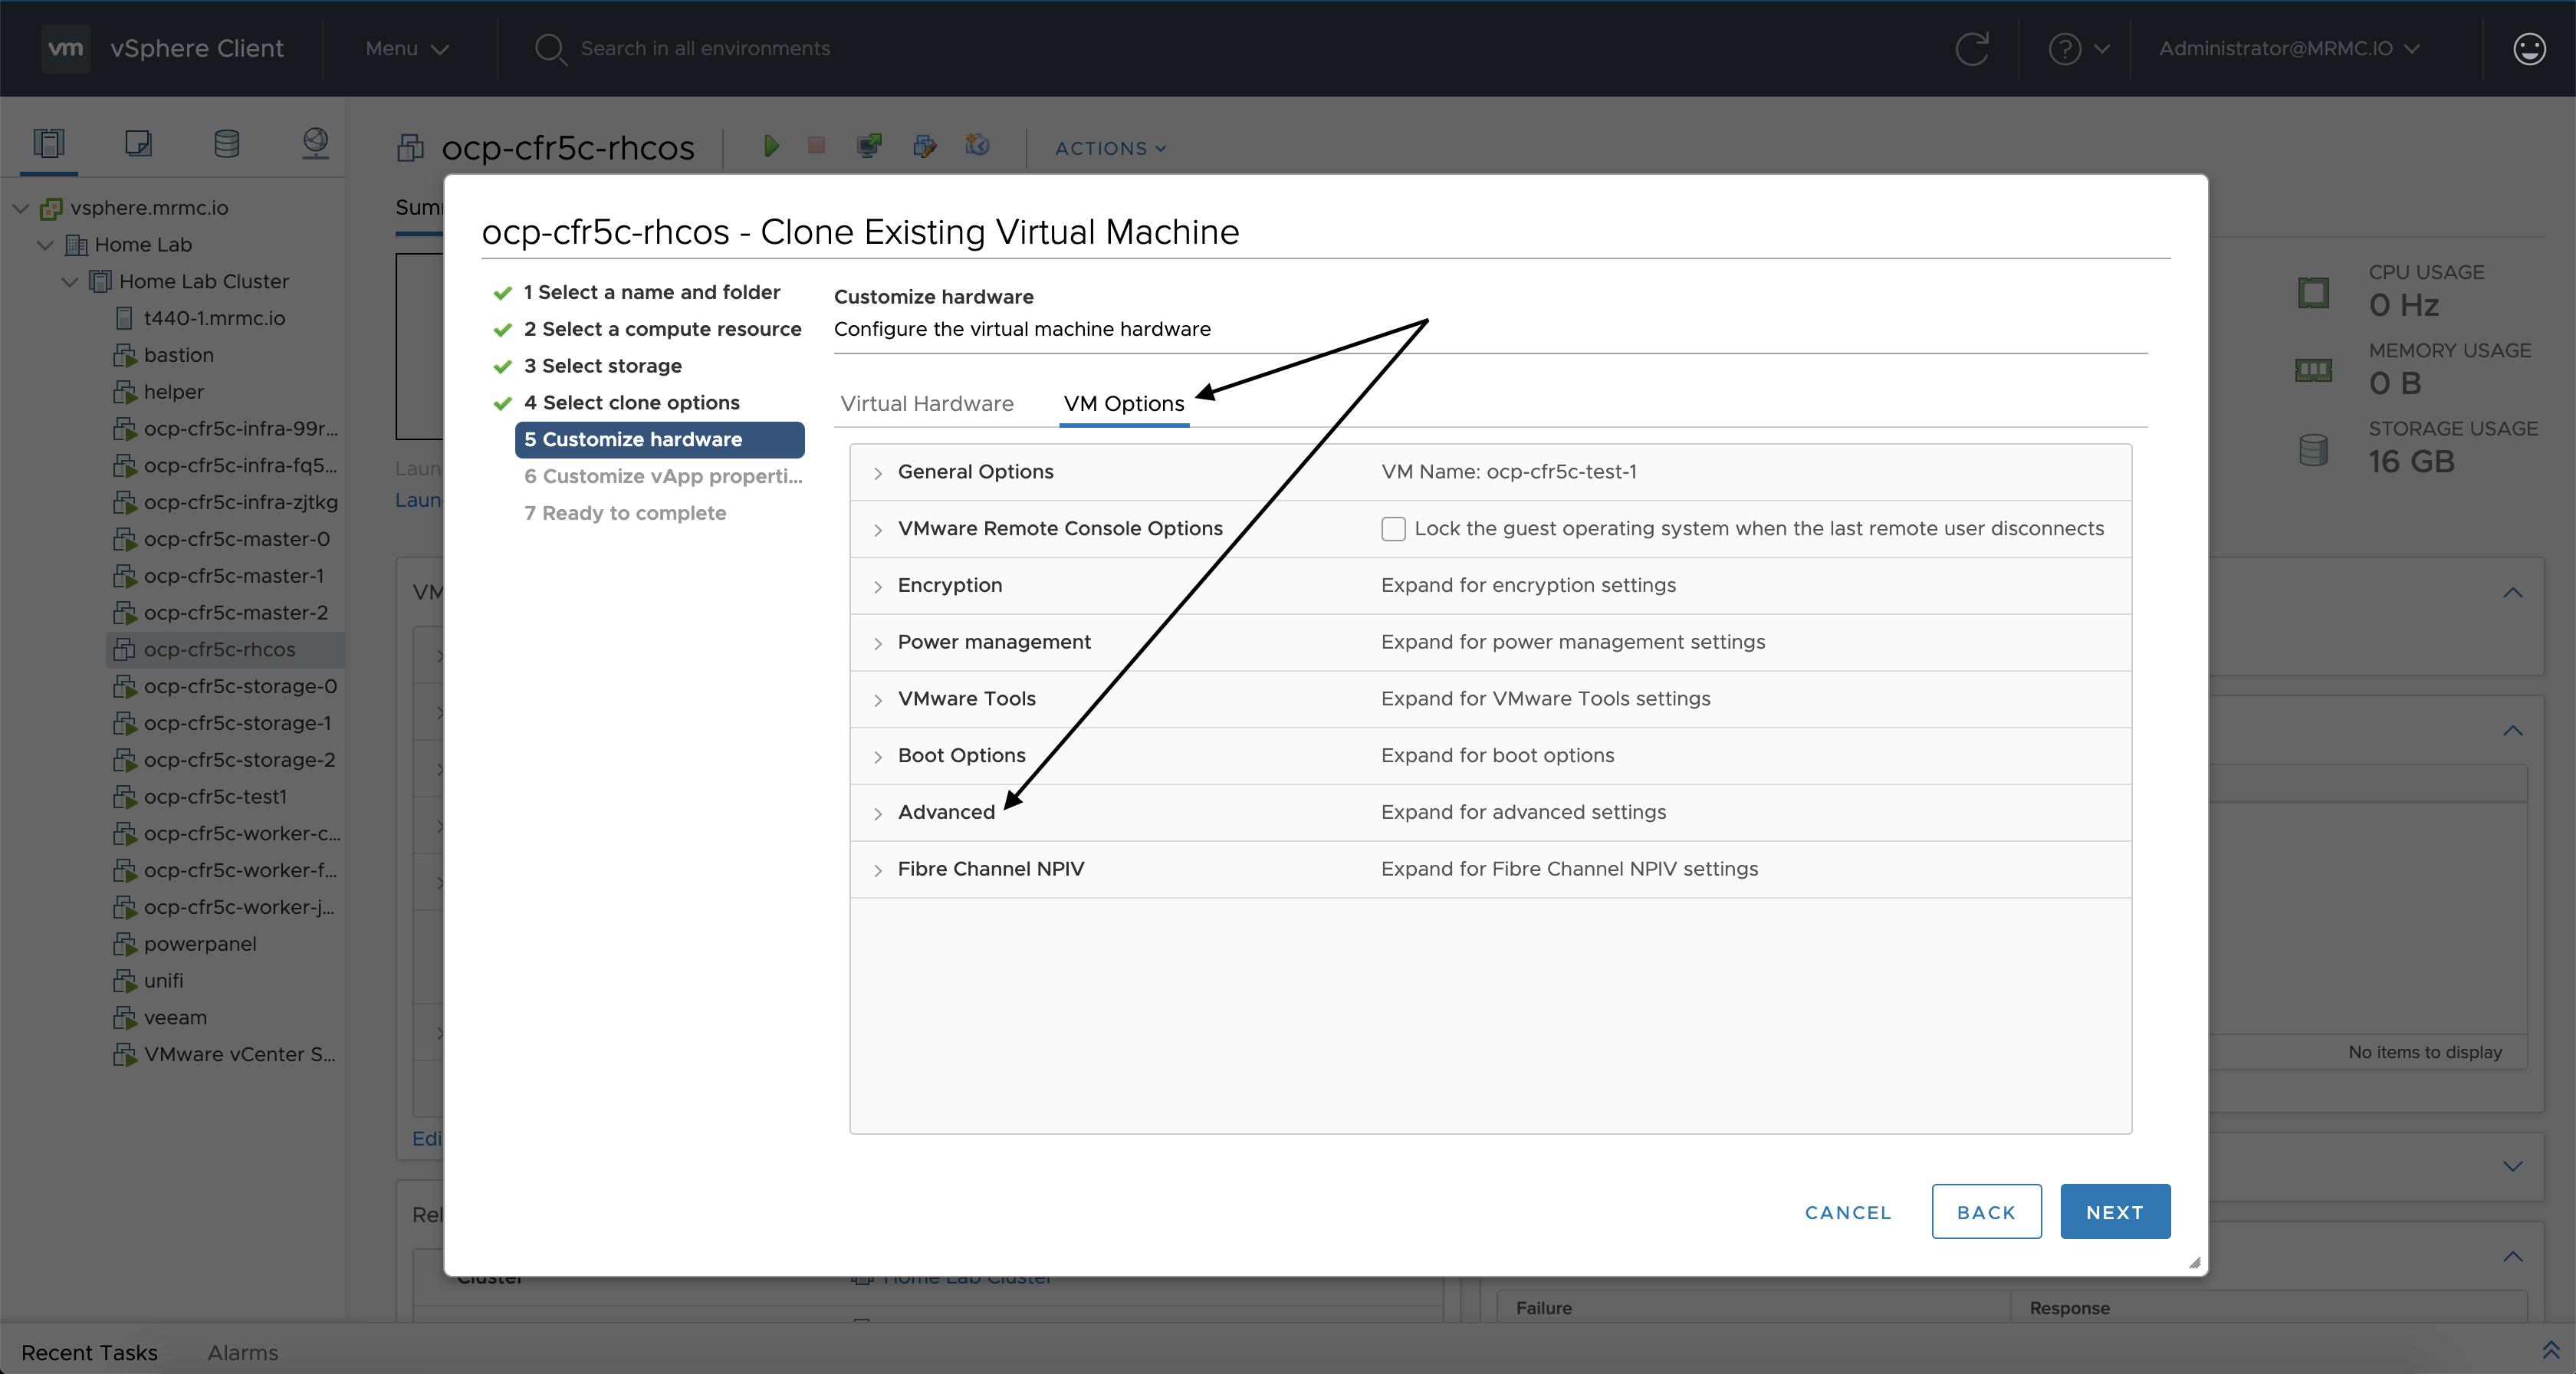 customize-hardware-vm-options-a